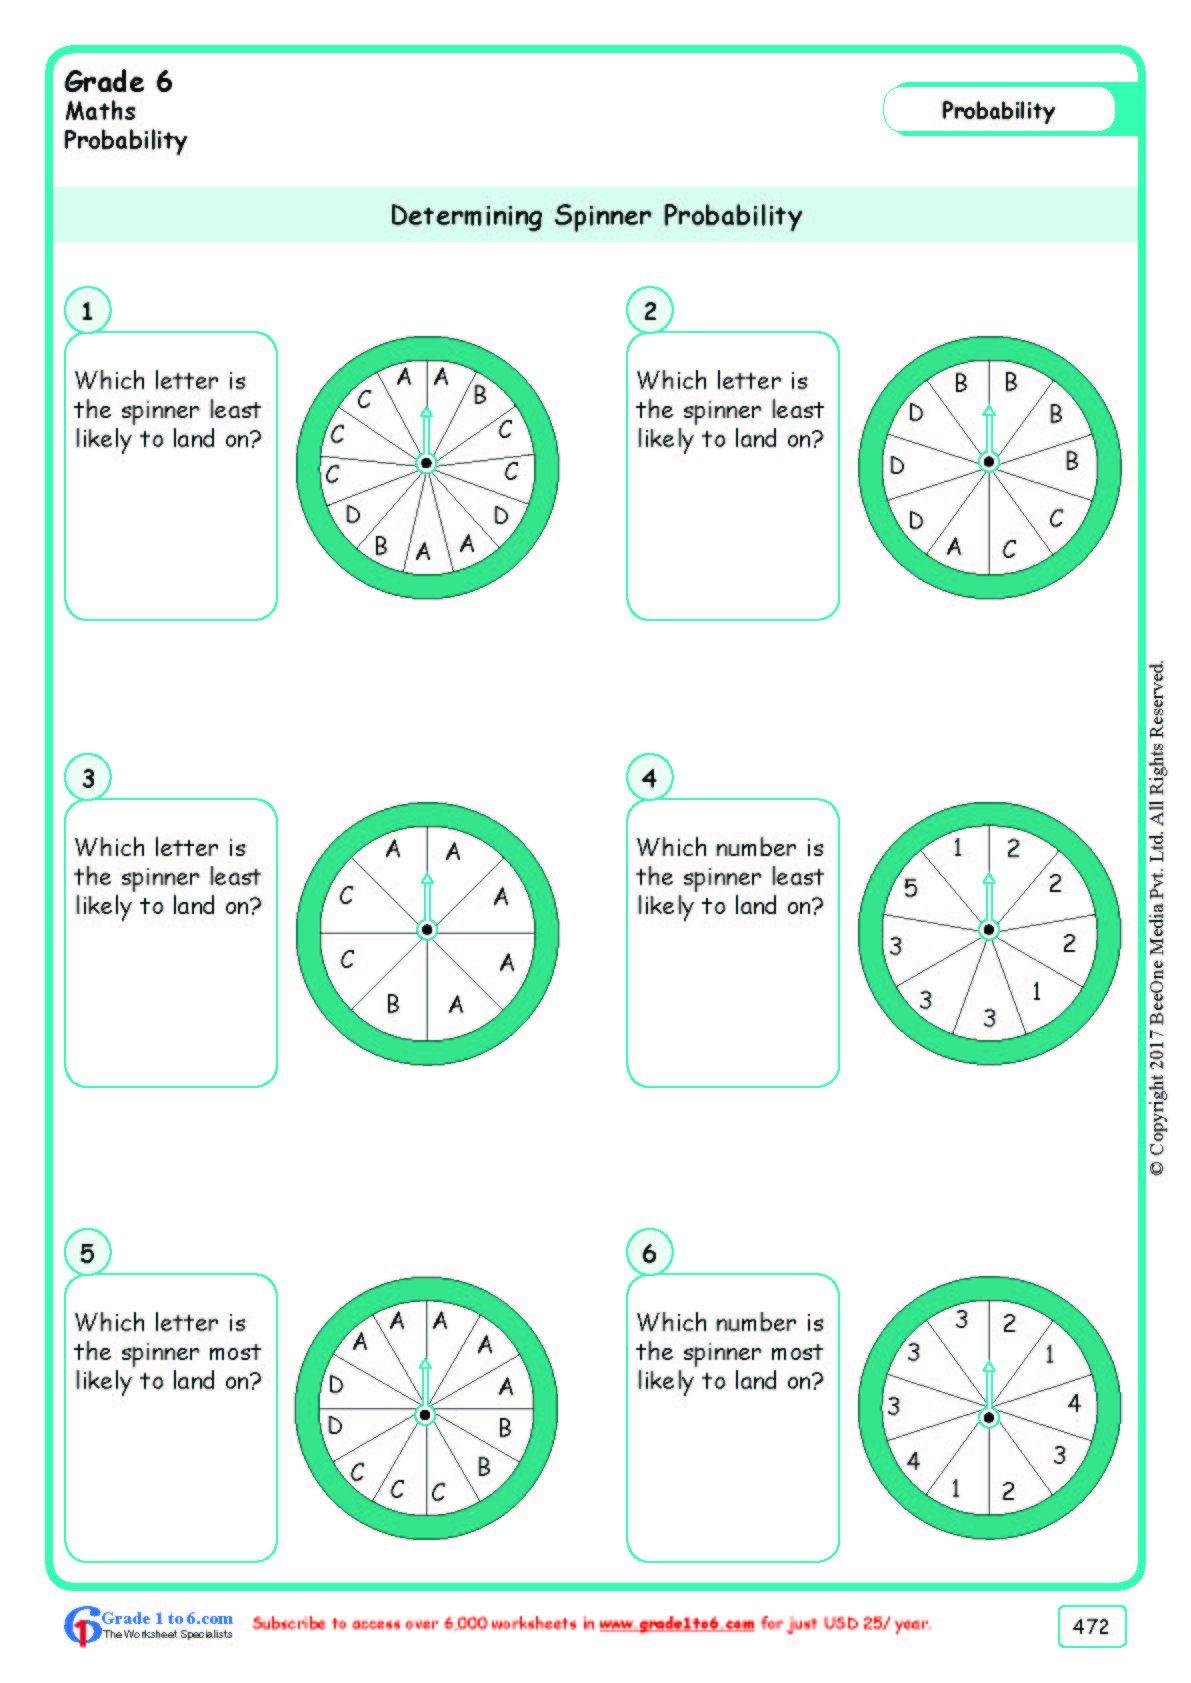 Worksheet Grade 6 Math Determining Spinner Probability In